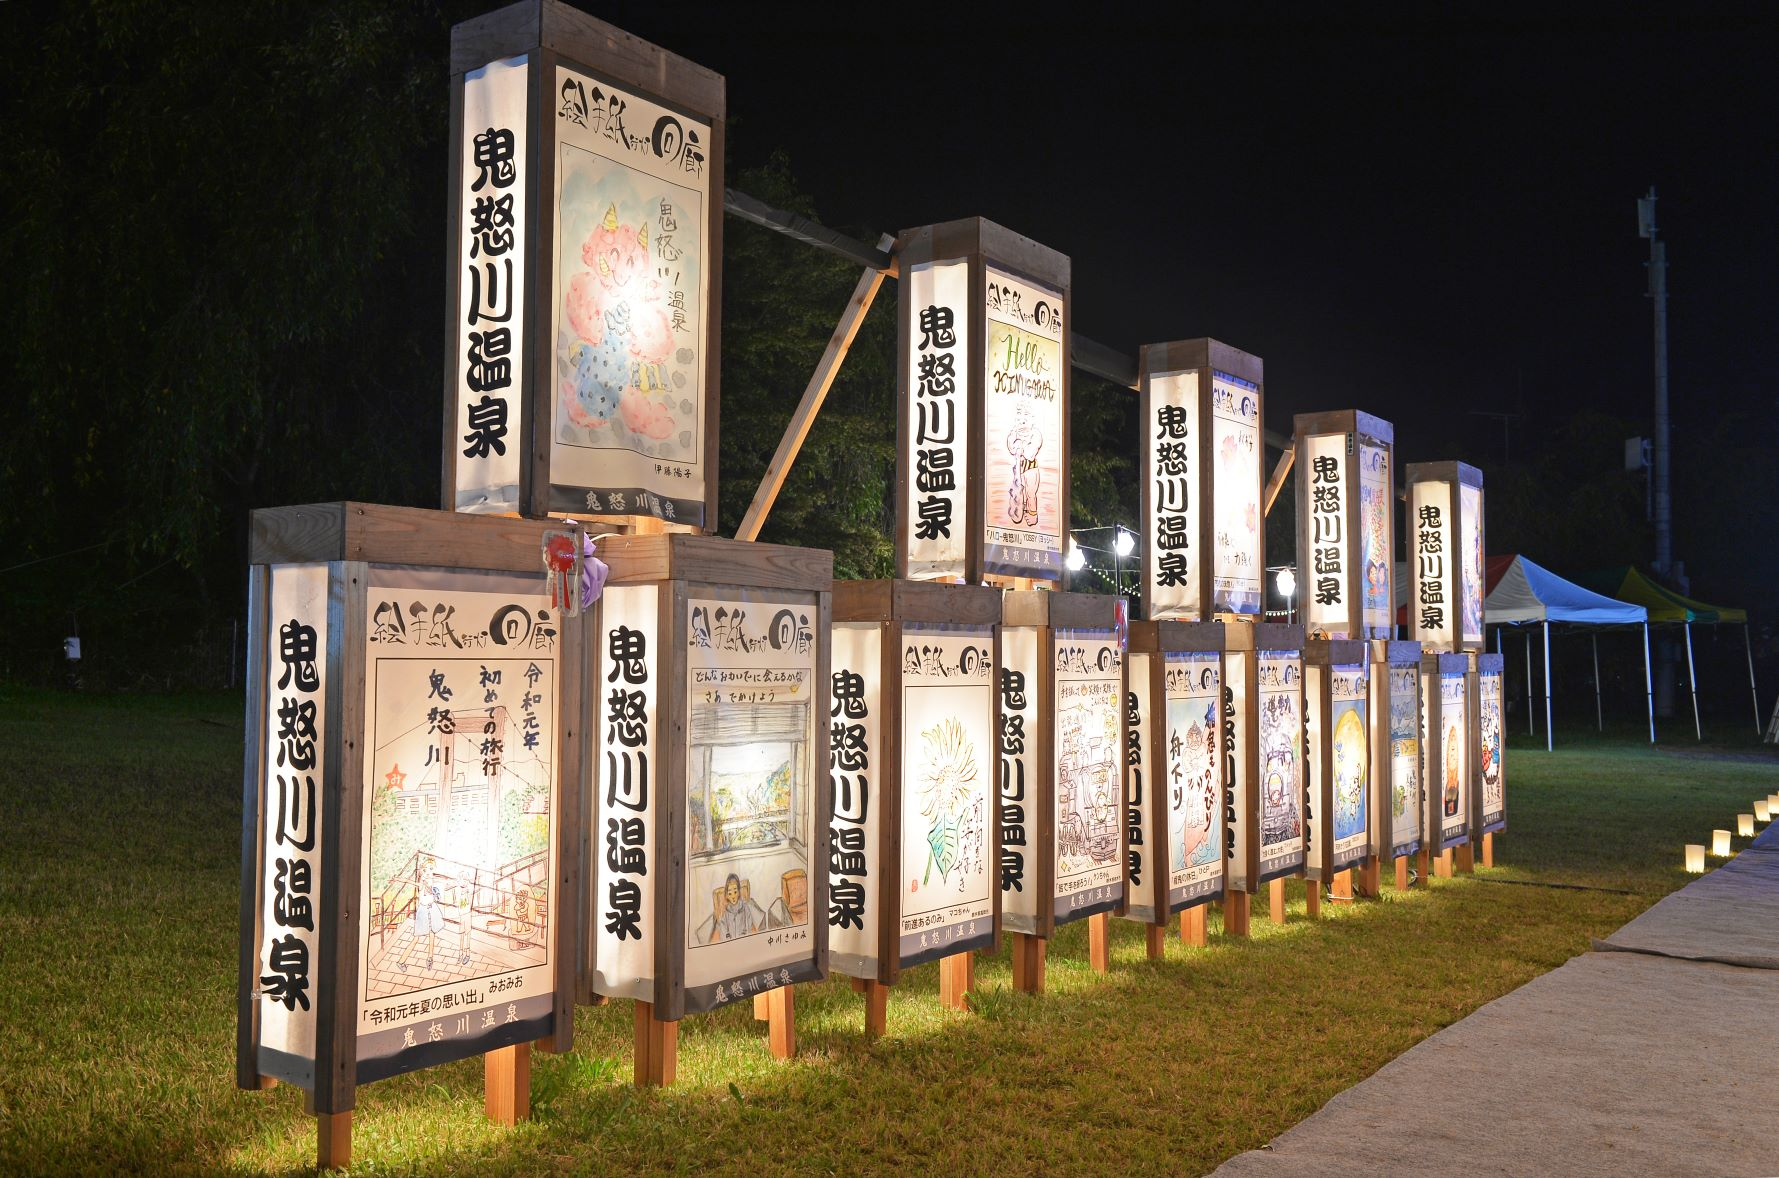 Illuminated Children's Art At Kinugawa Onsen